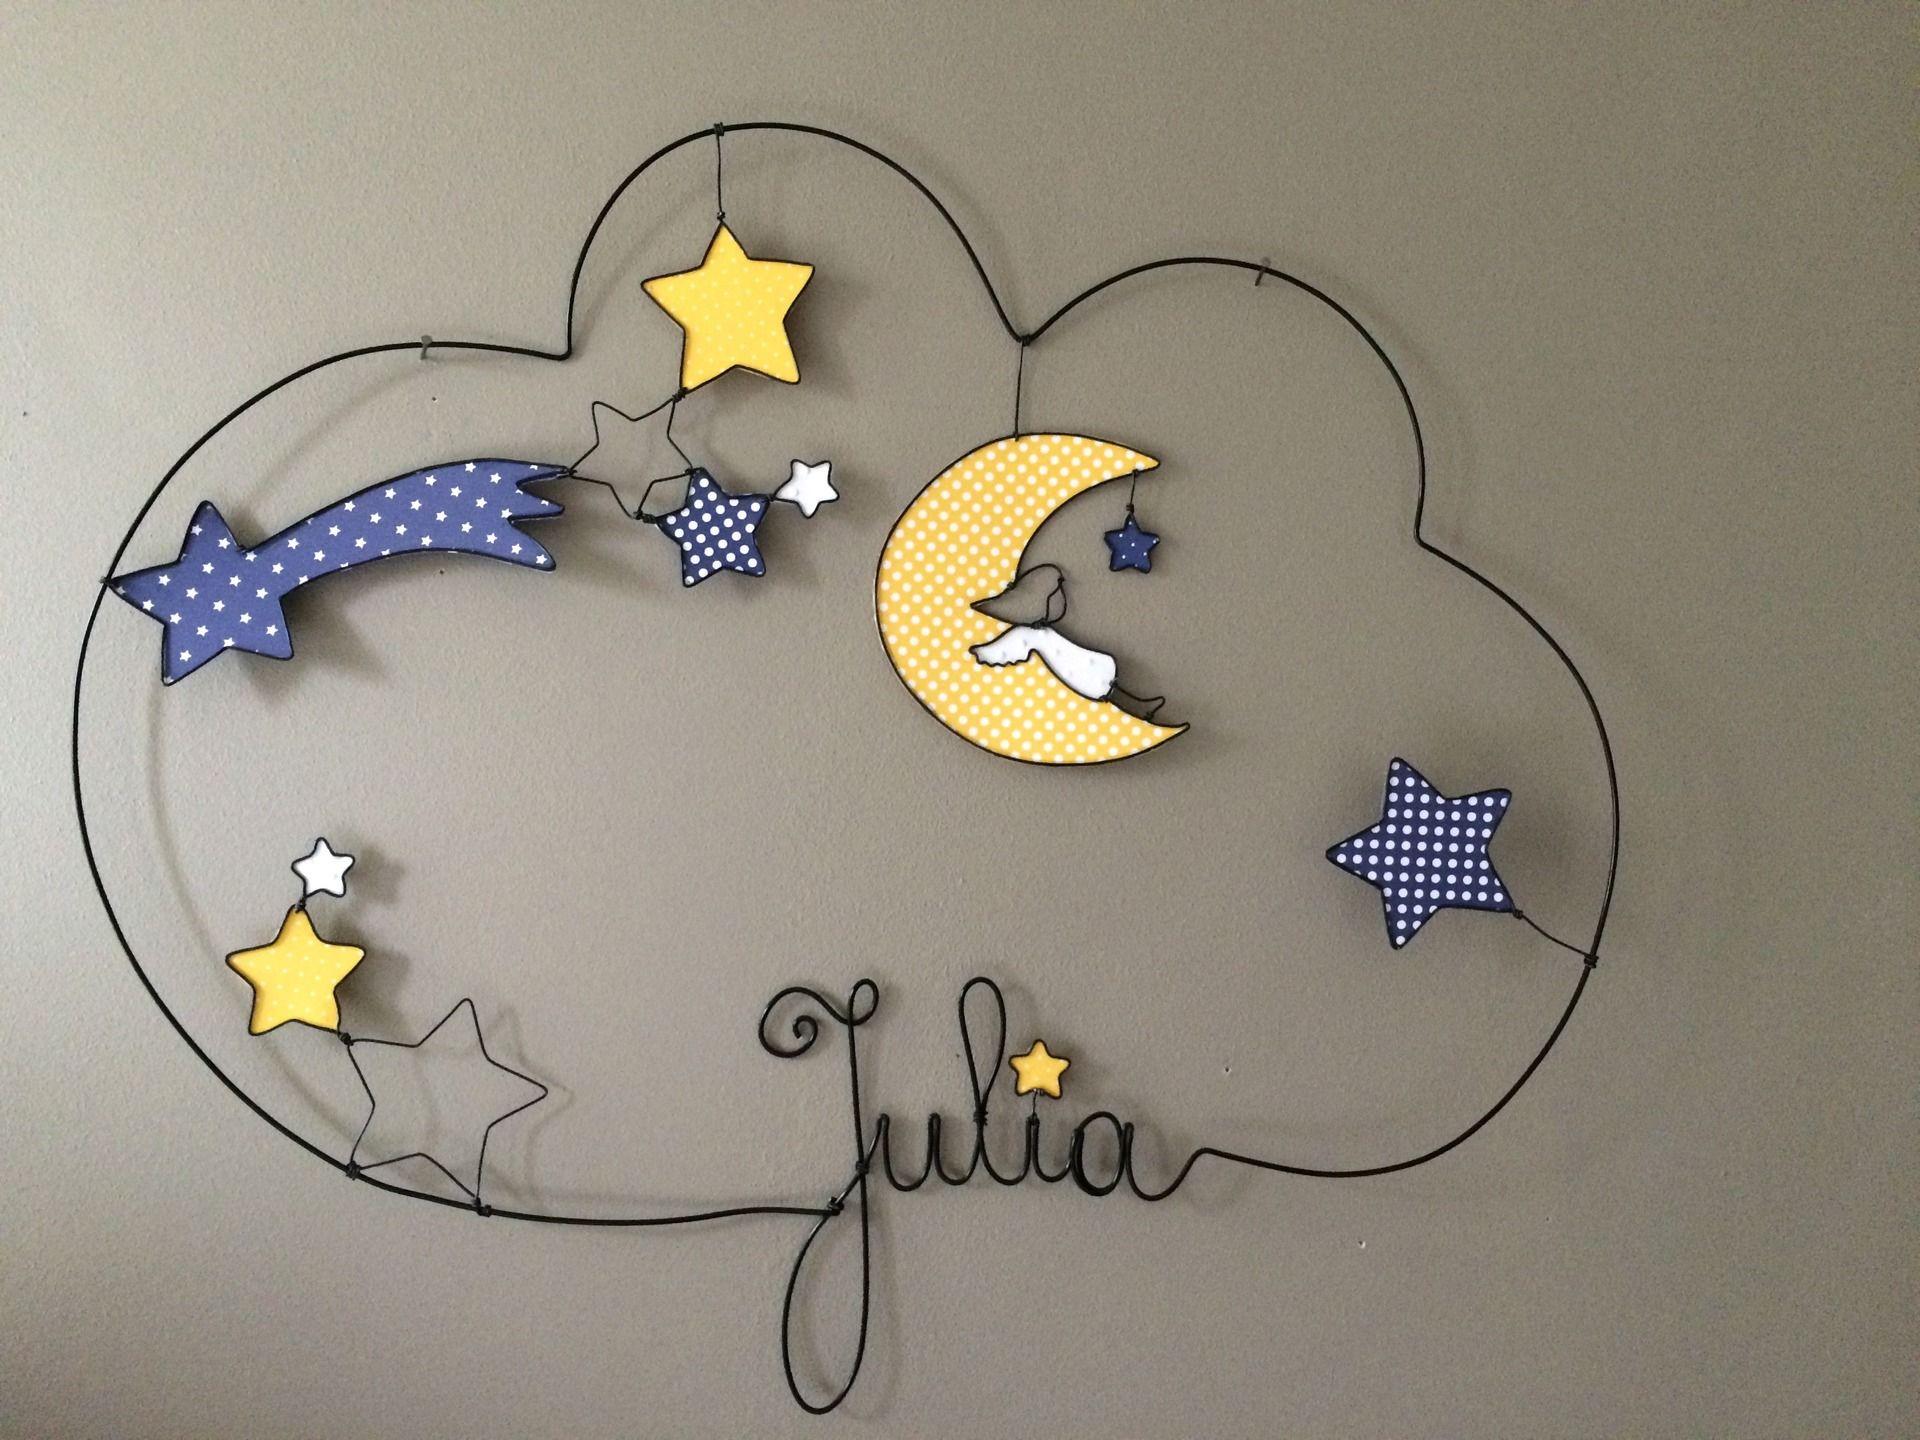 prenom fil de fer julia etoile d coration pour enfants. Black Bedroom Furniture Sets. Home Design Ideas